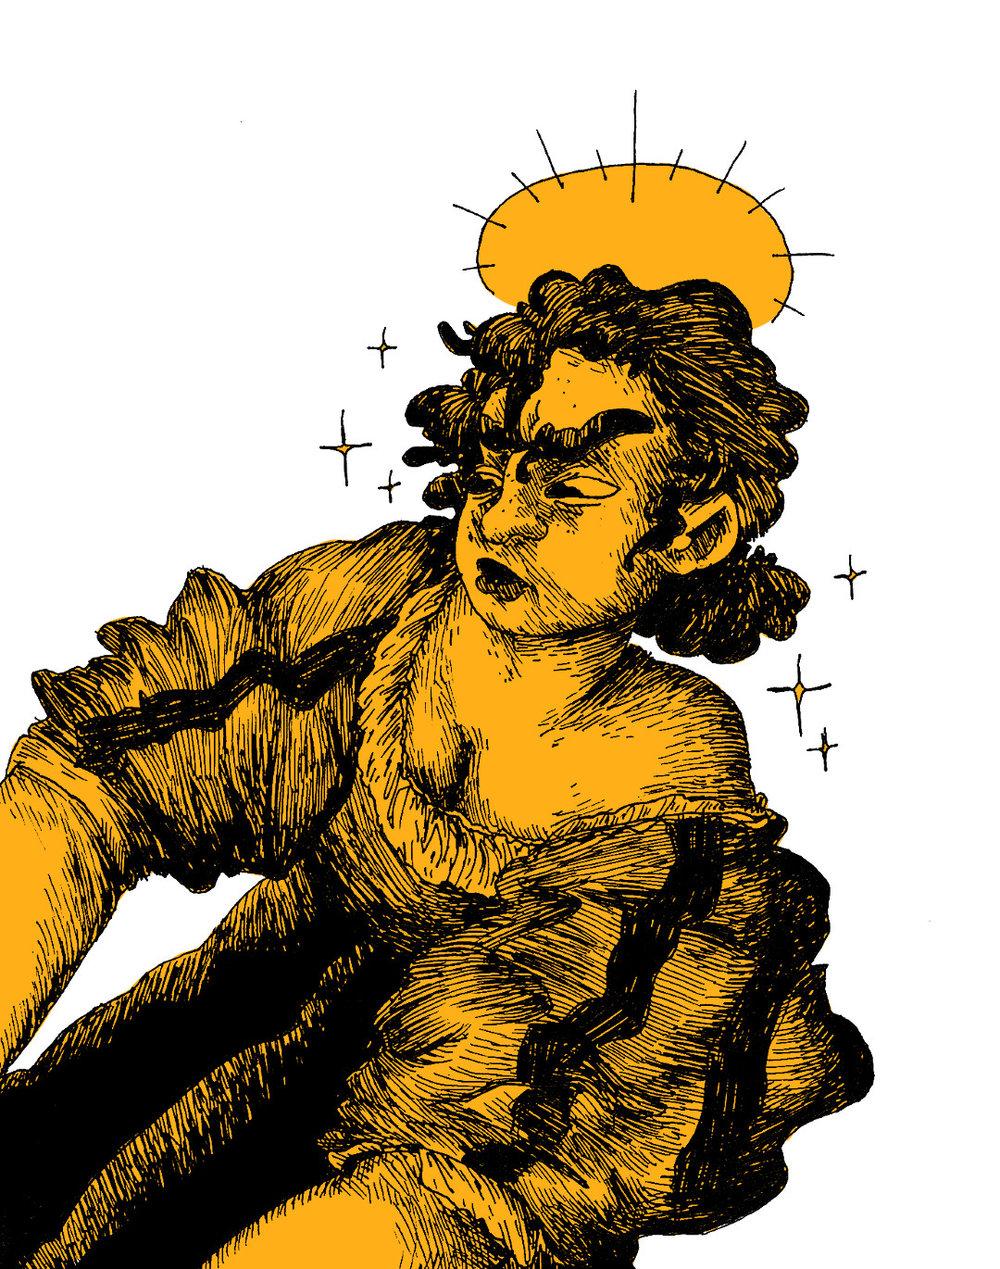 Judith Slaying Holoferne (Artemesia Deserved Justice)